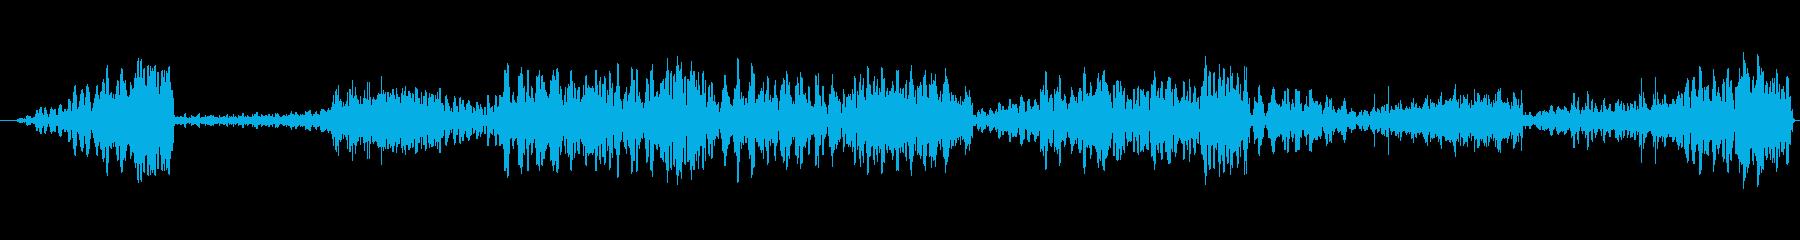 SciFi EC01_88_3の再生済みの波形